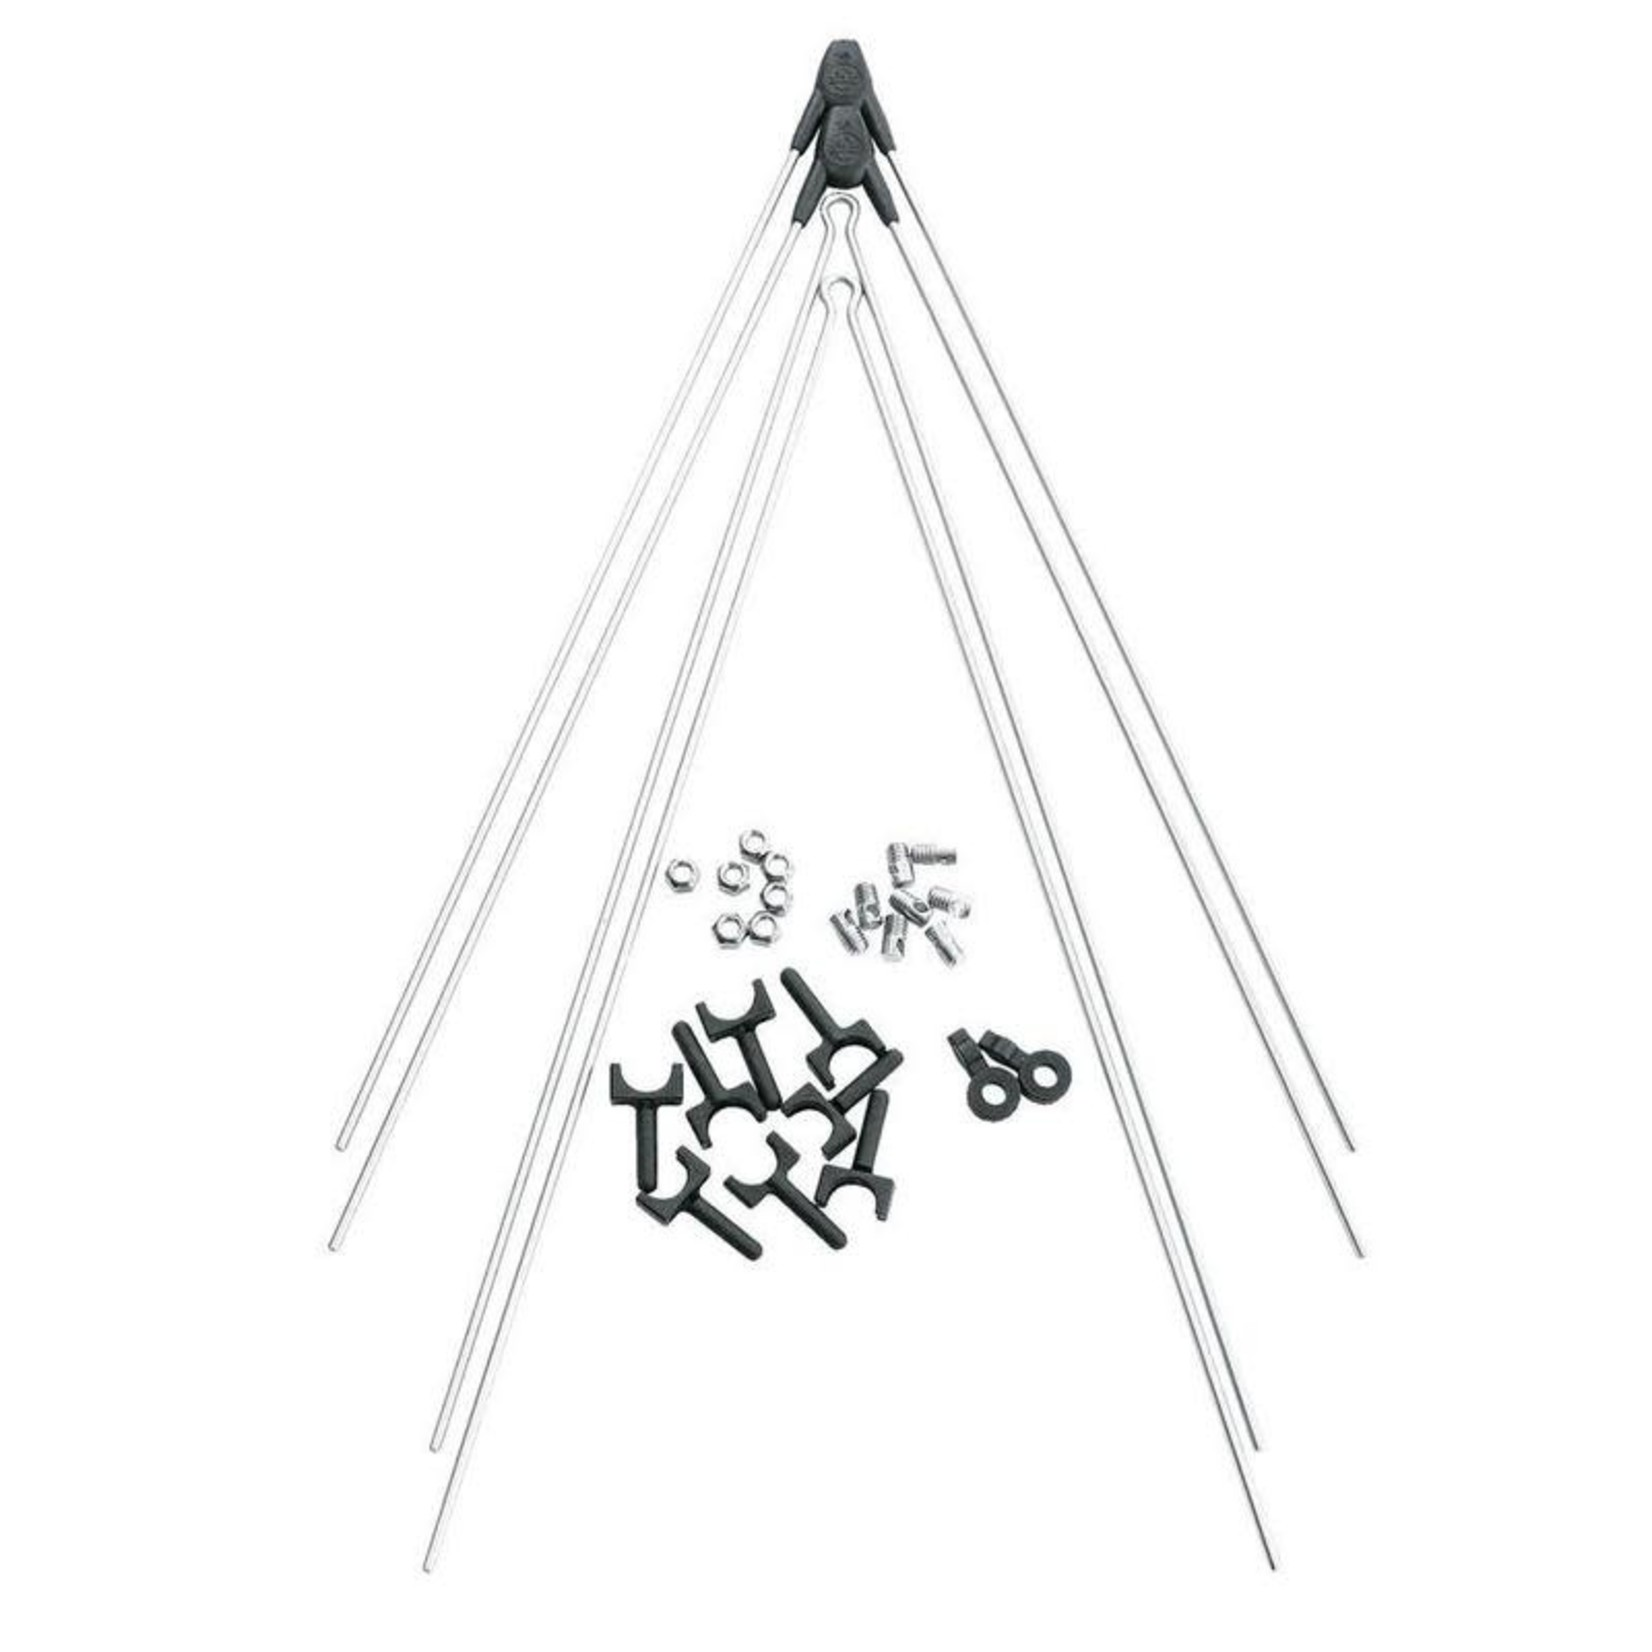 SKS SKS Xtra Long V-Stay Kit, 4 x 380mm